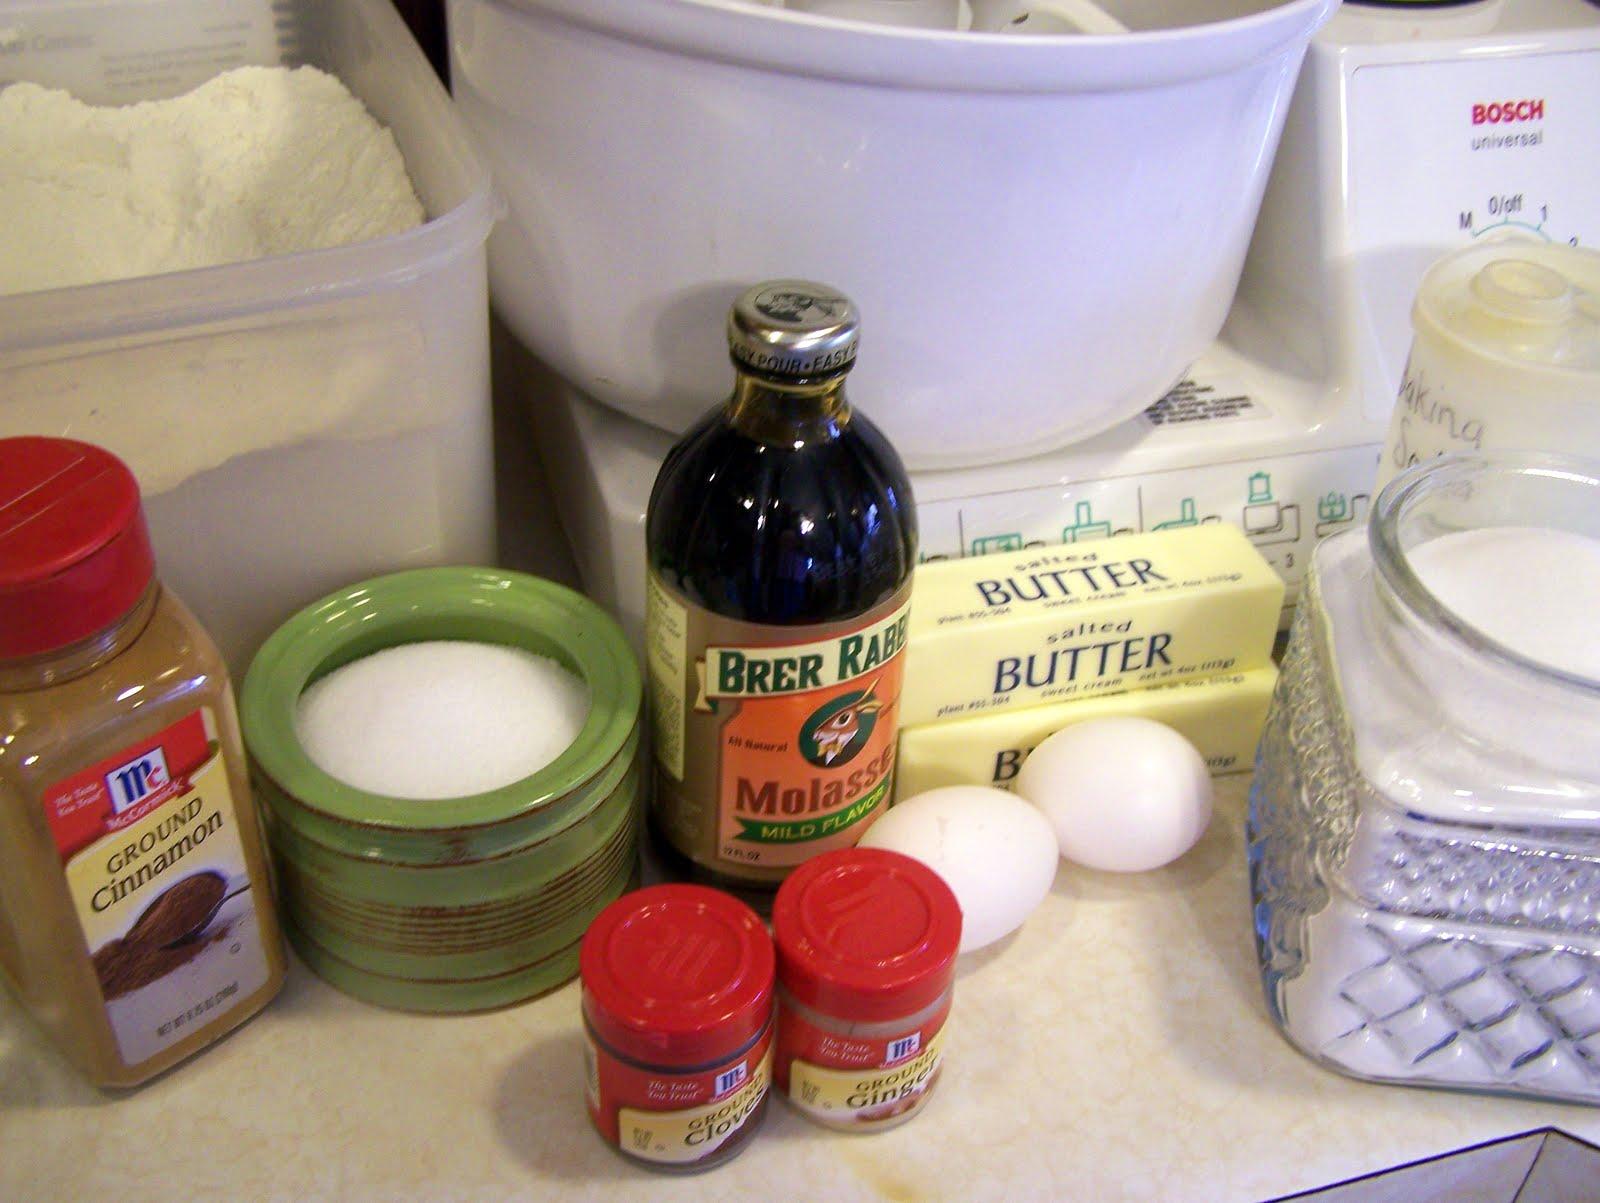 Brer Rabbit Molasses Sugar Cookies Cup Brer Rabbit Molasses